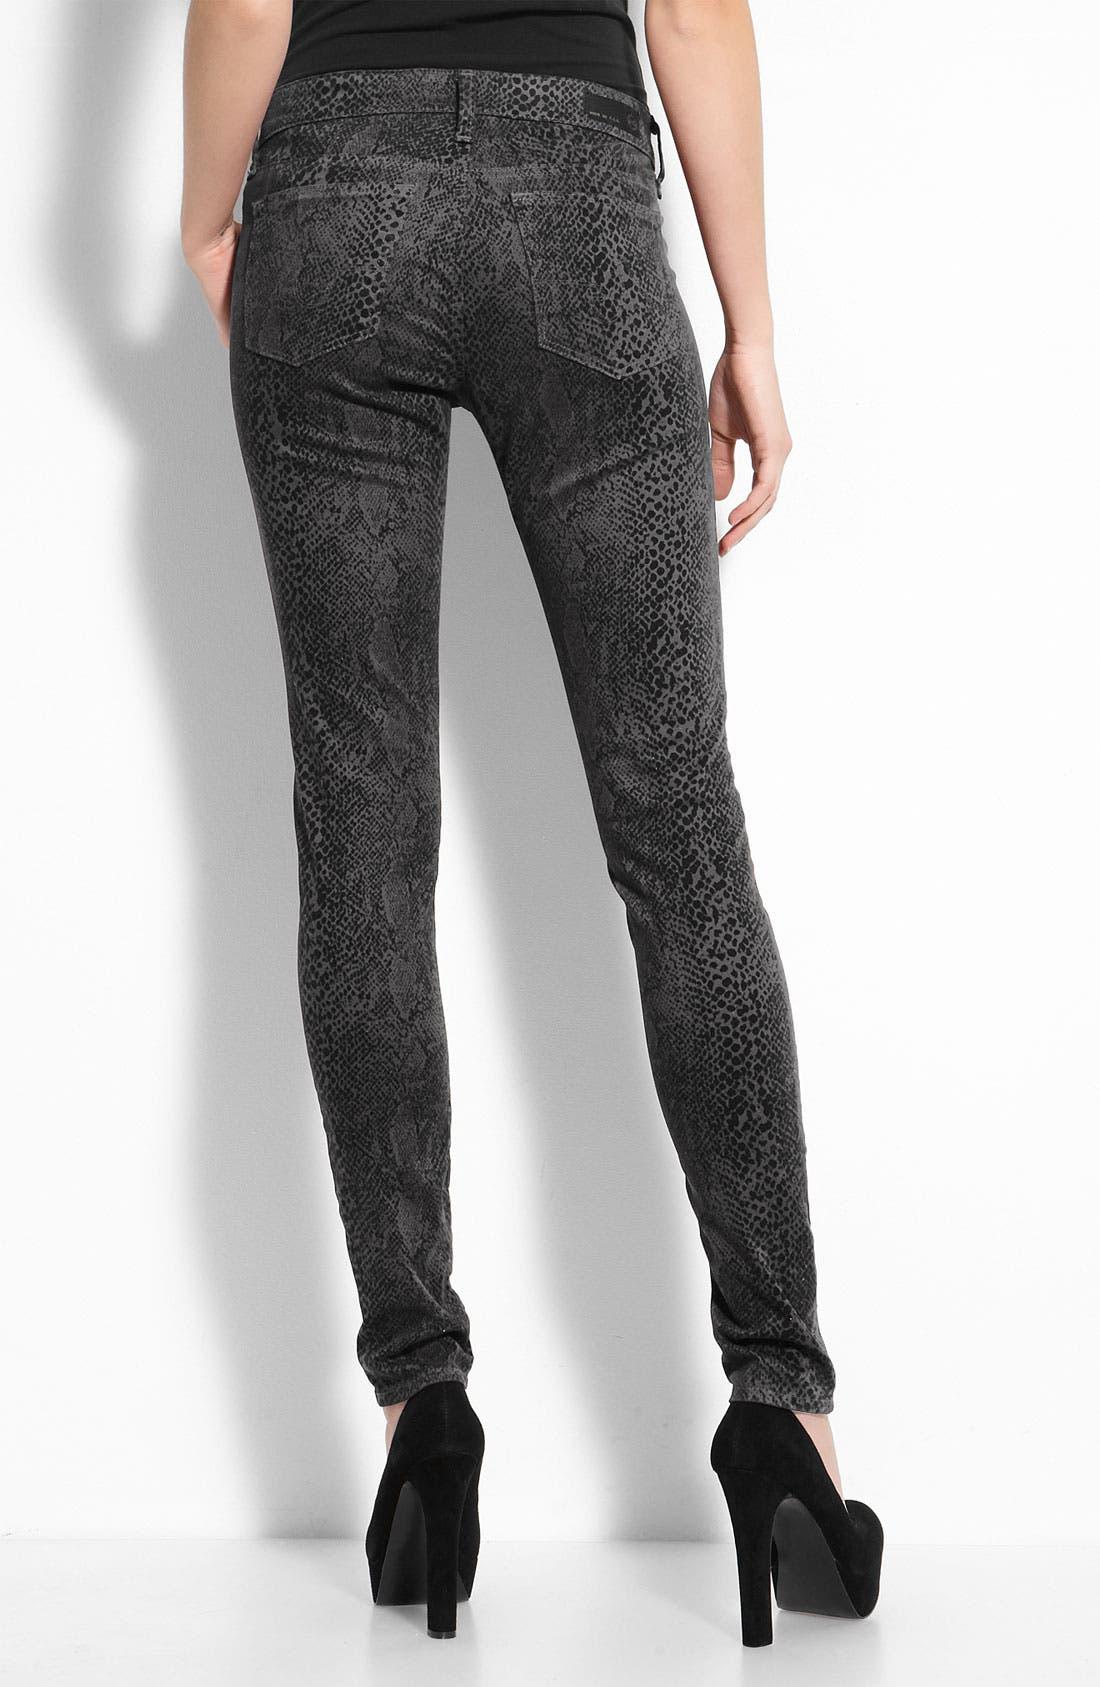 Jeans Sateen Snake Print Leggings,                         Main,                         color, 020